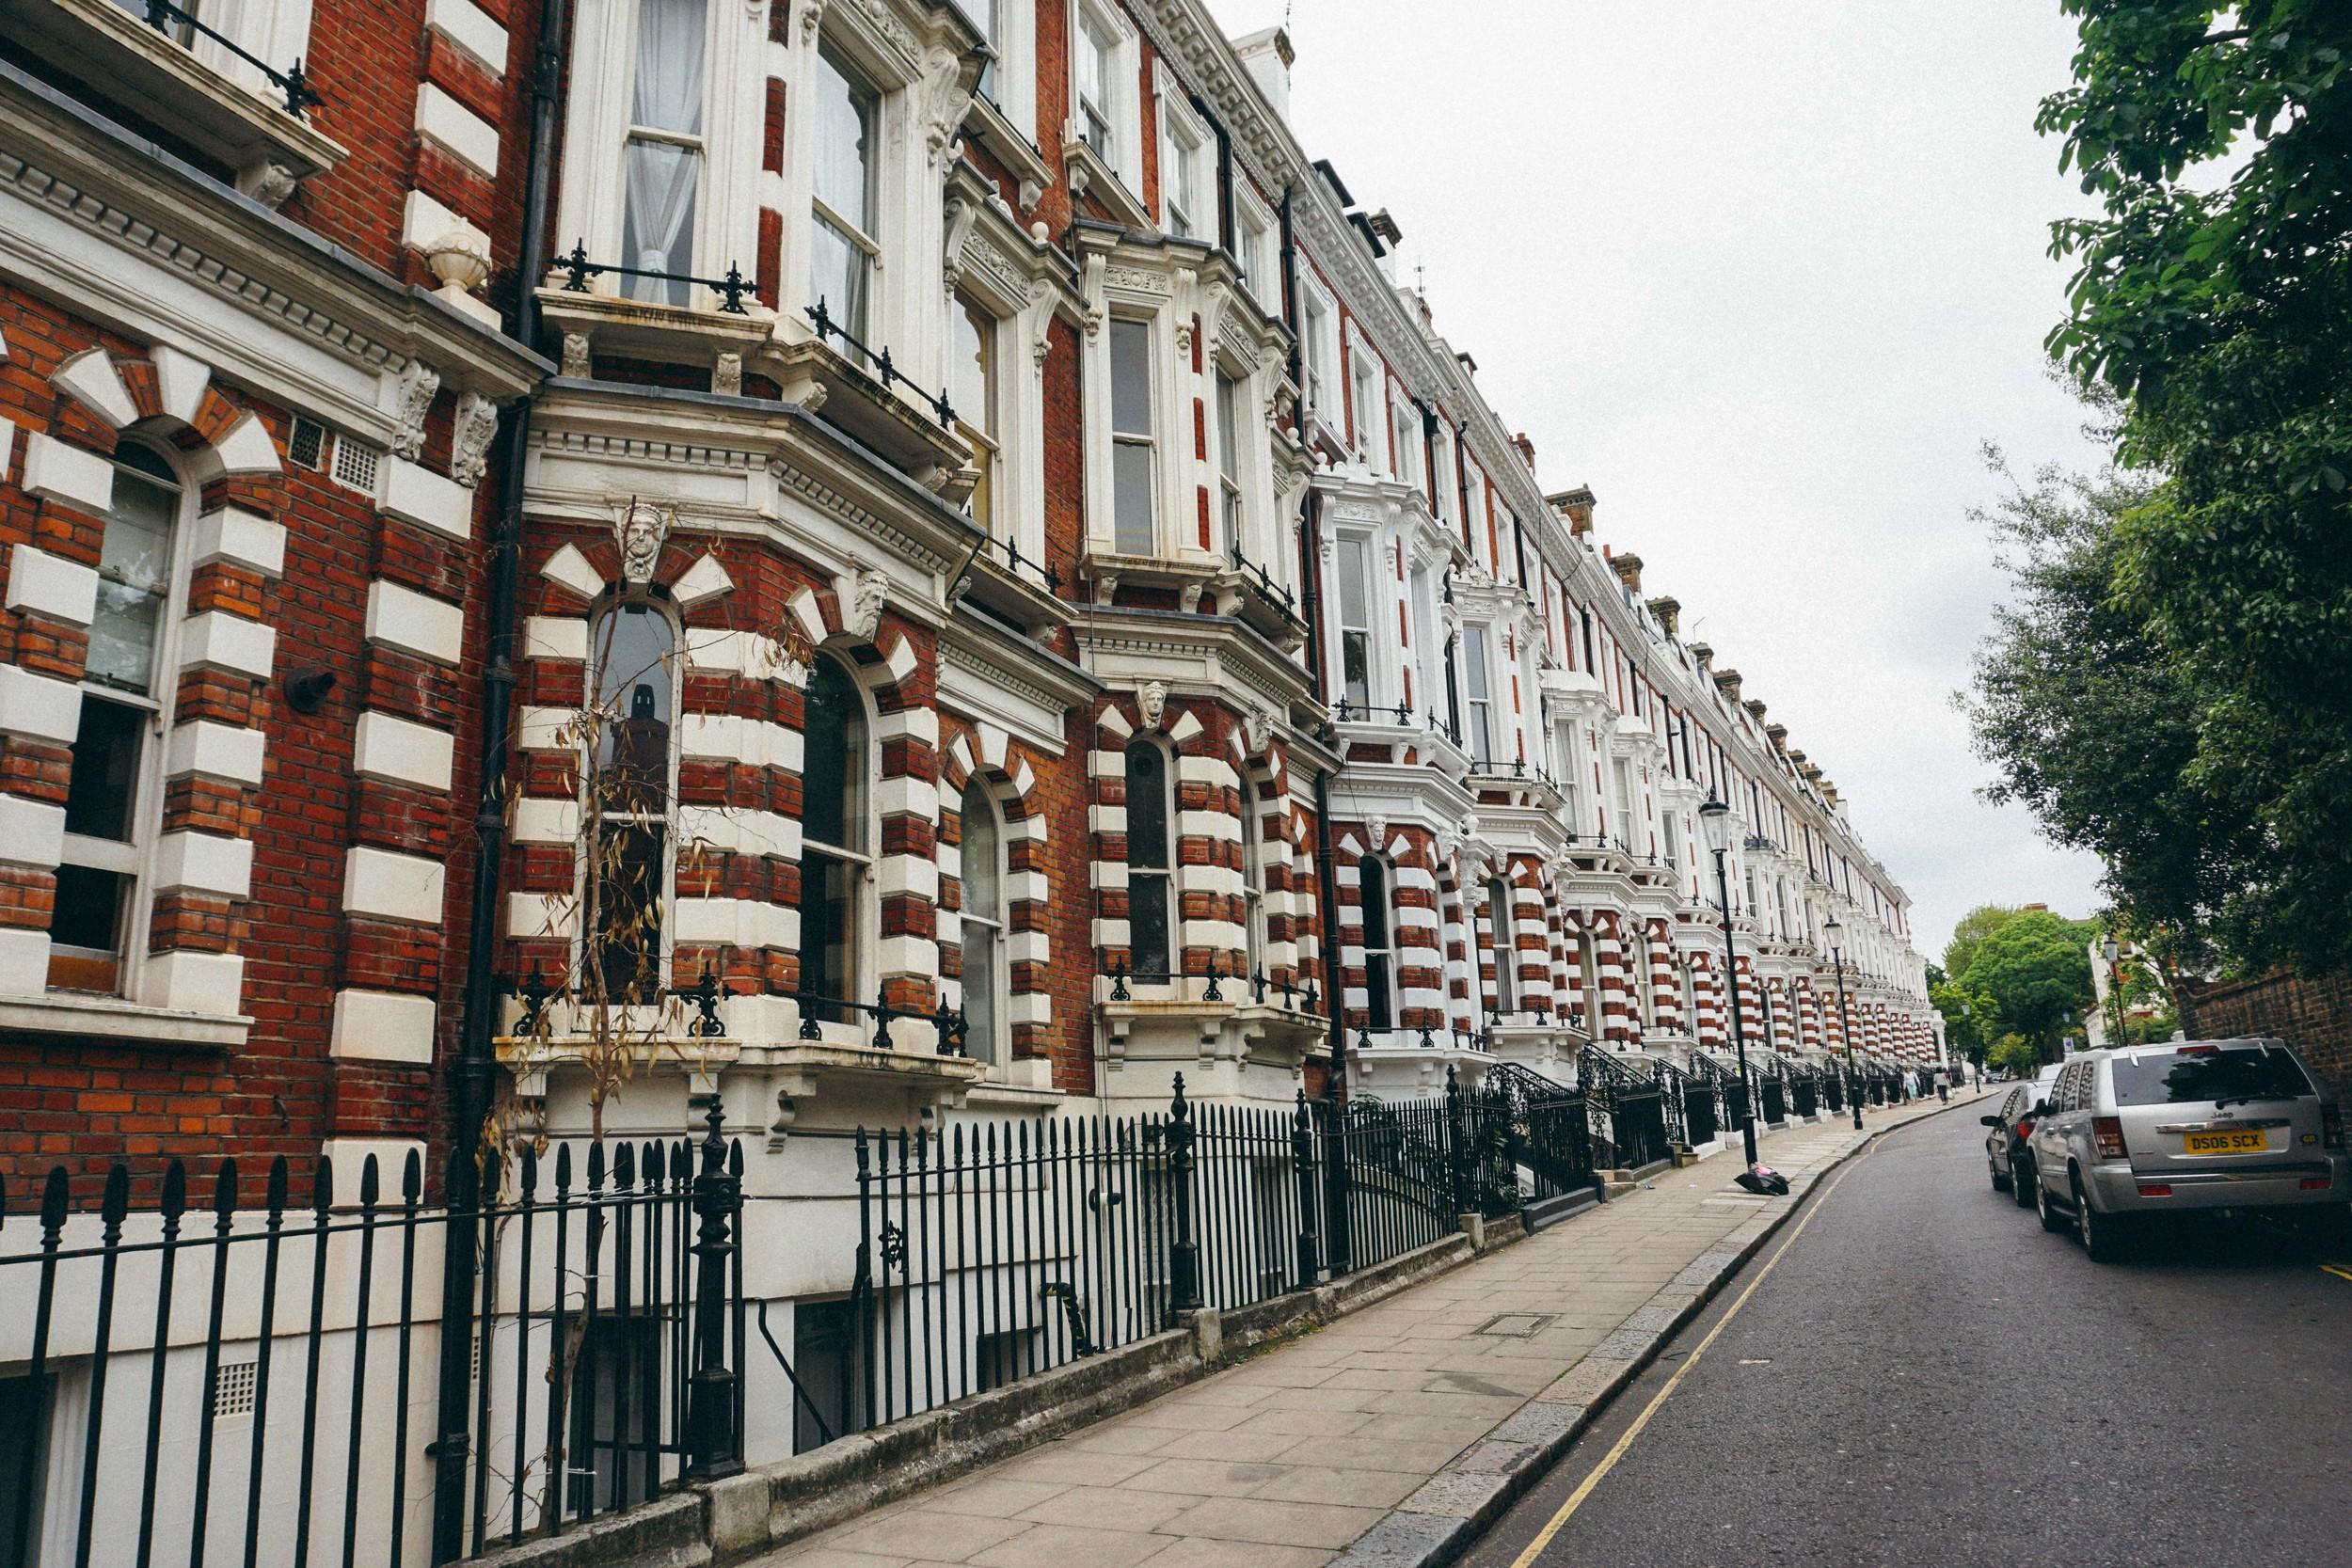 Flats/ Houses in Chelsea, Kensington London